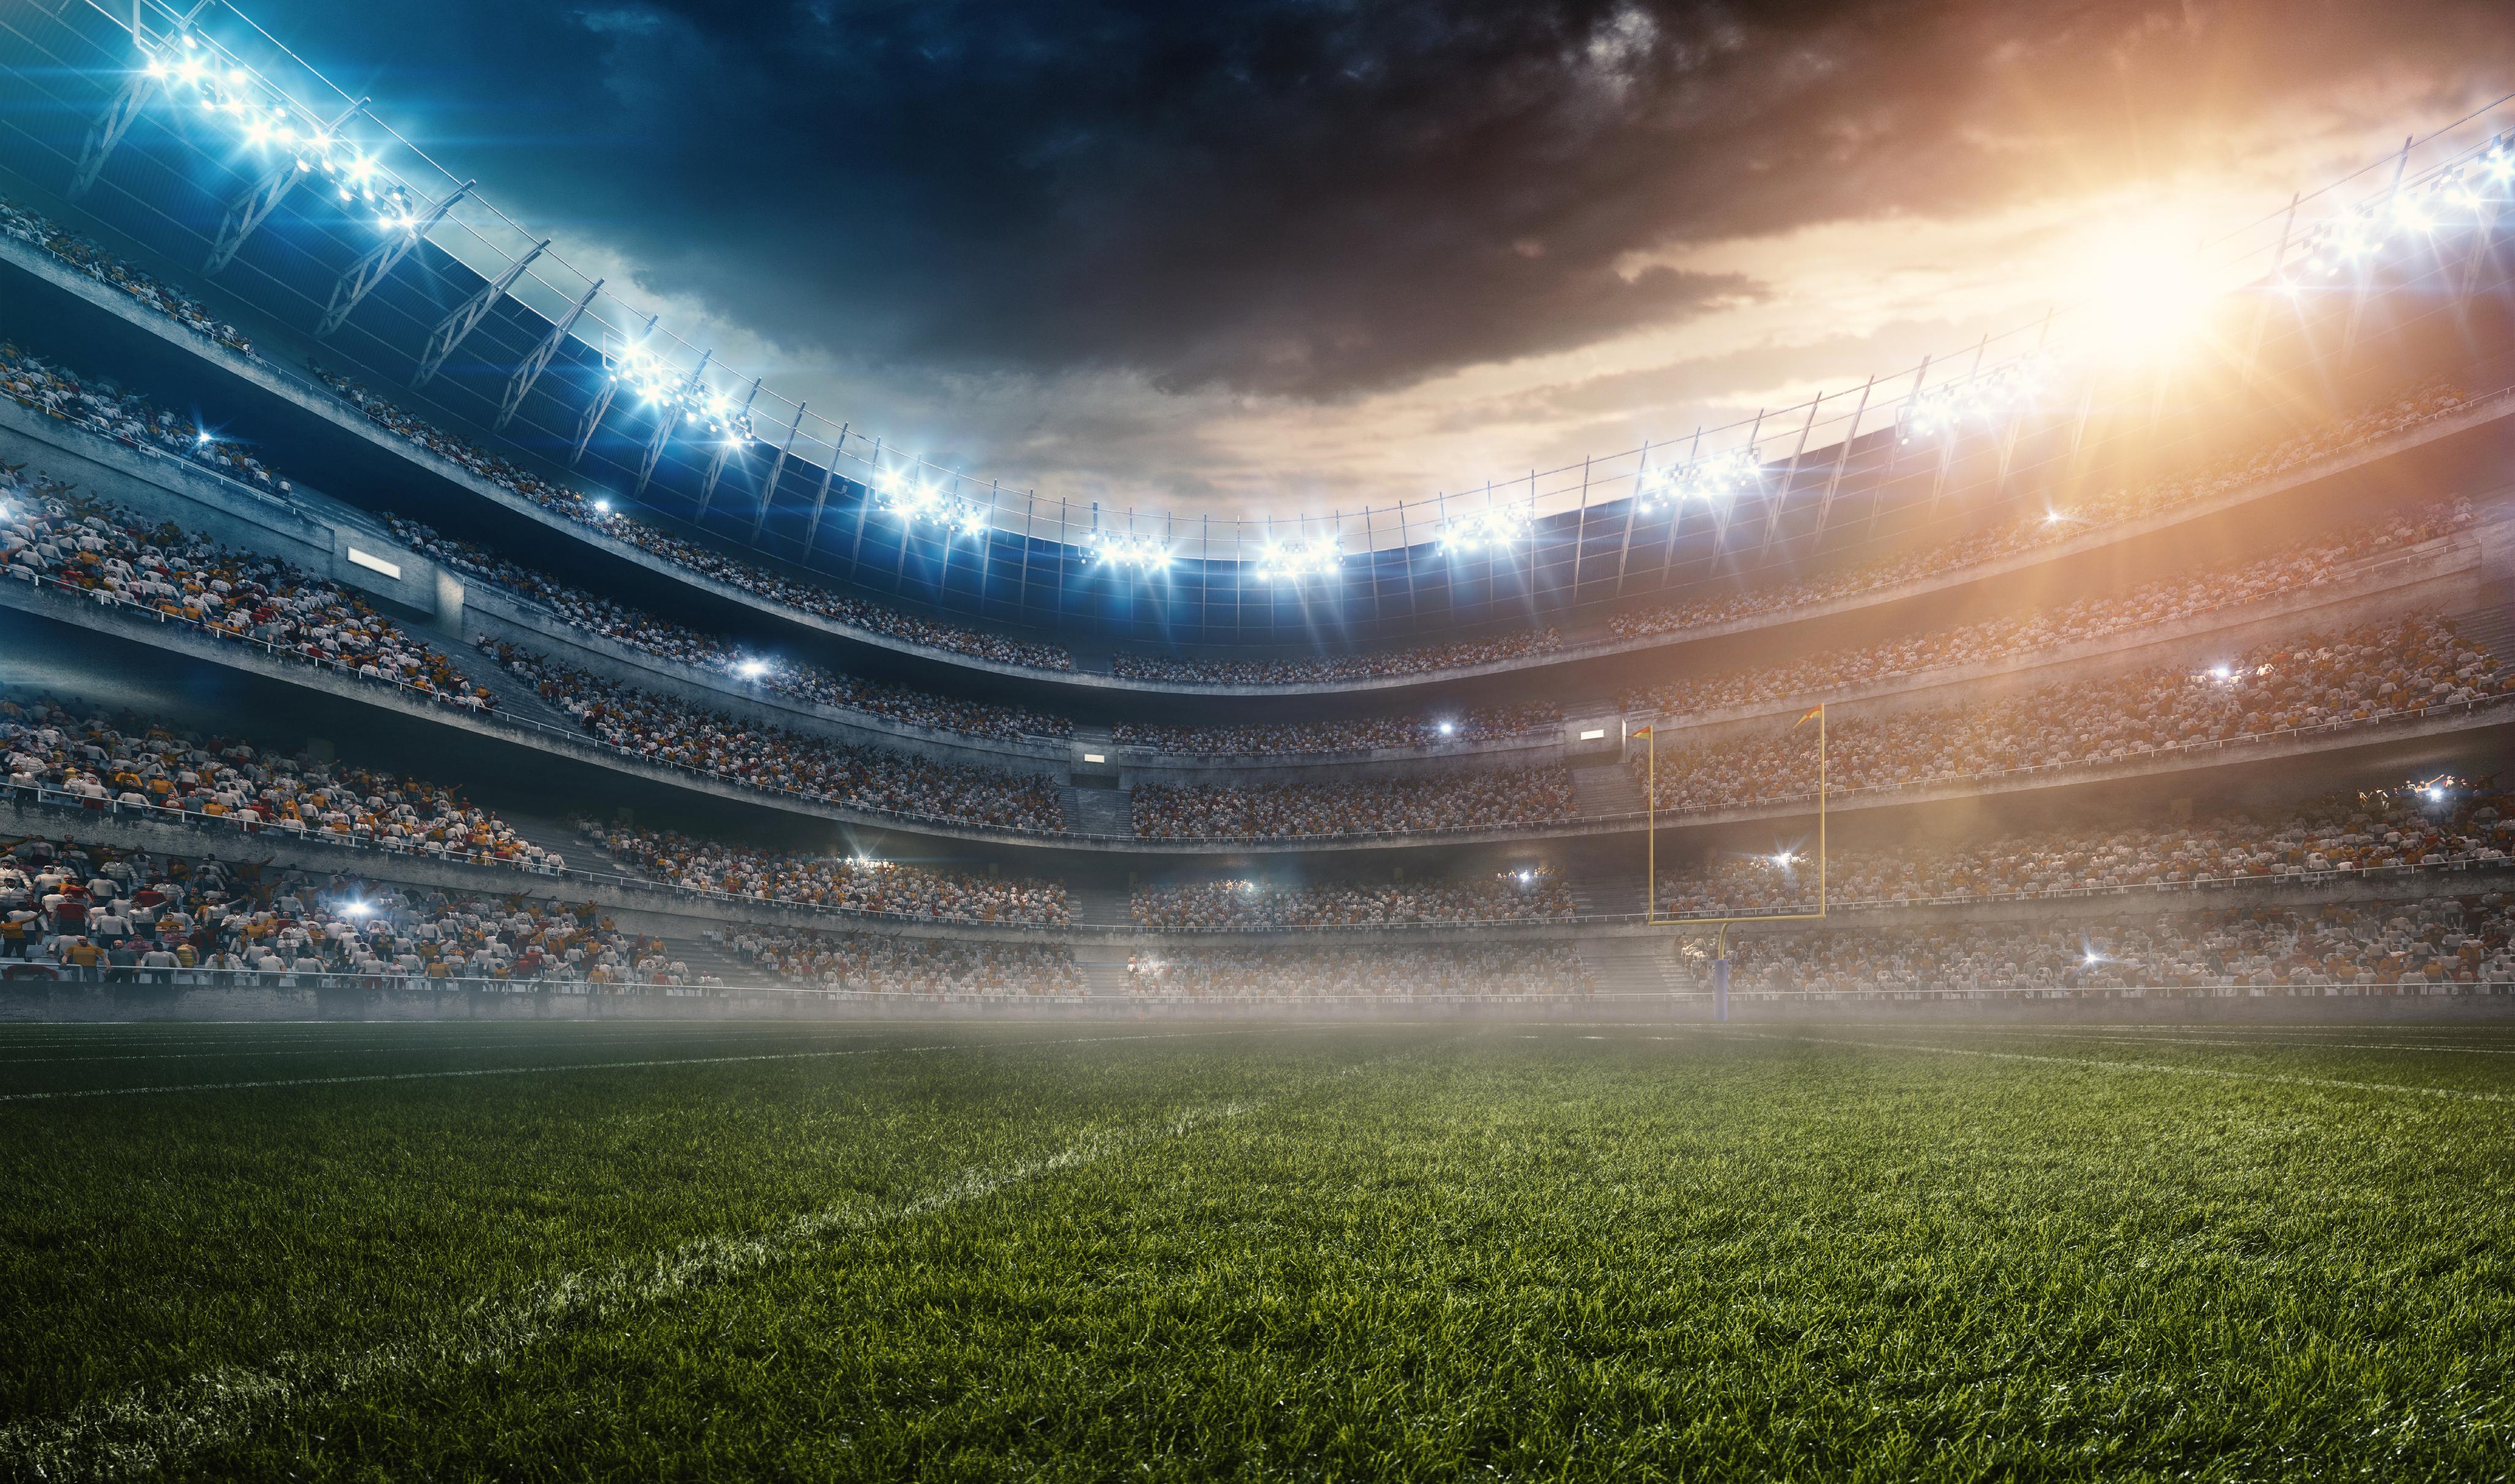 Dramatic american football stadium - Focus for Health